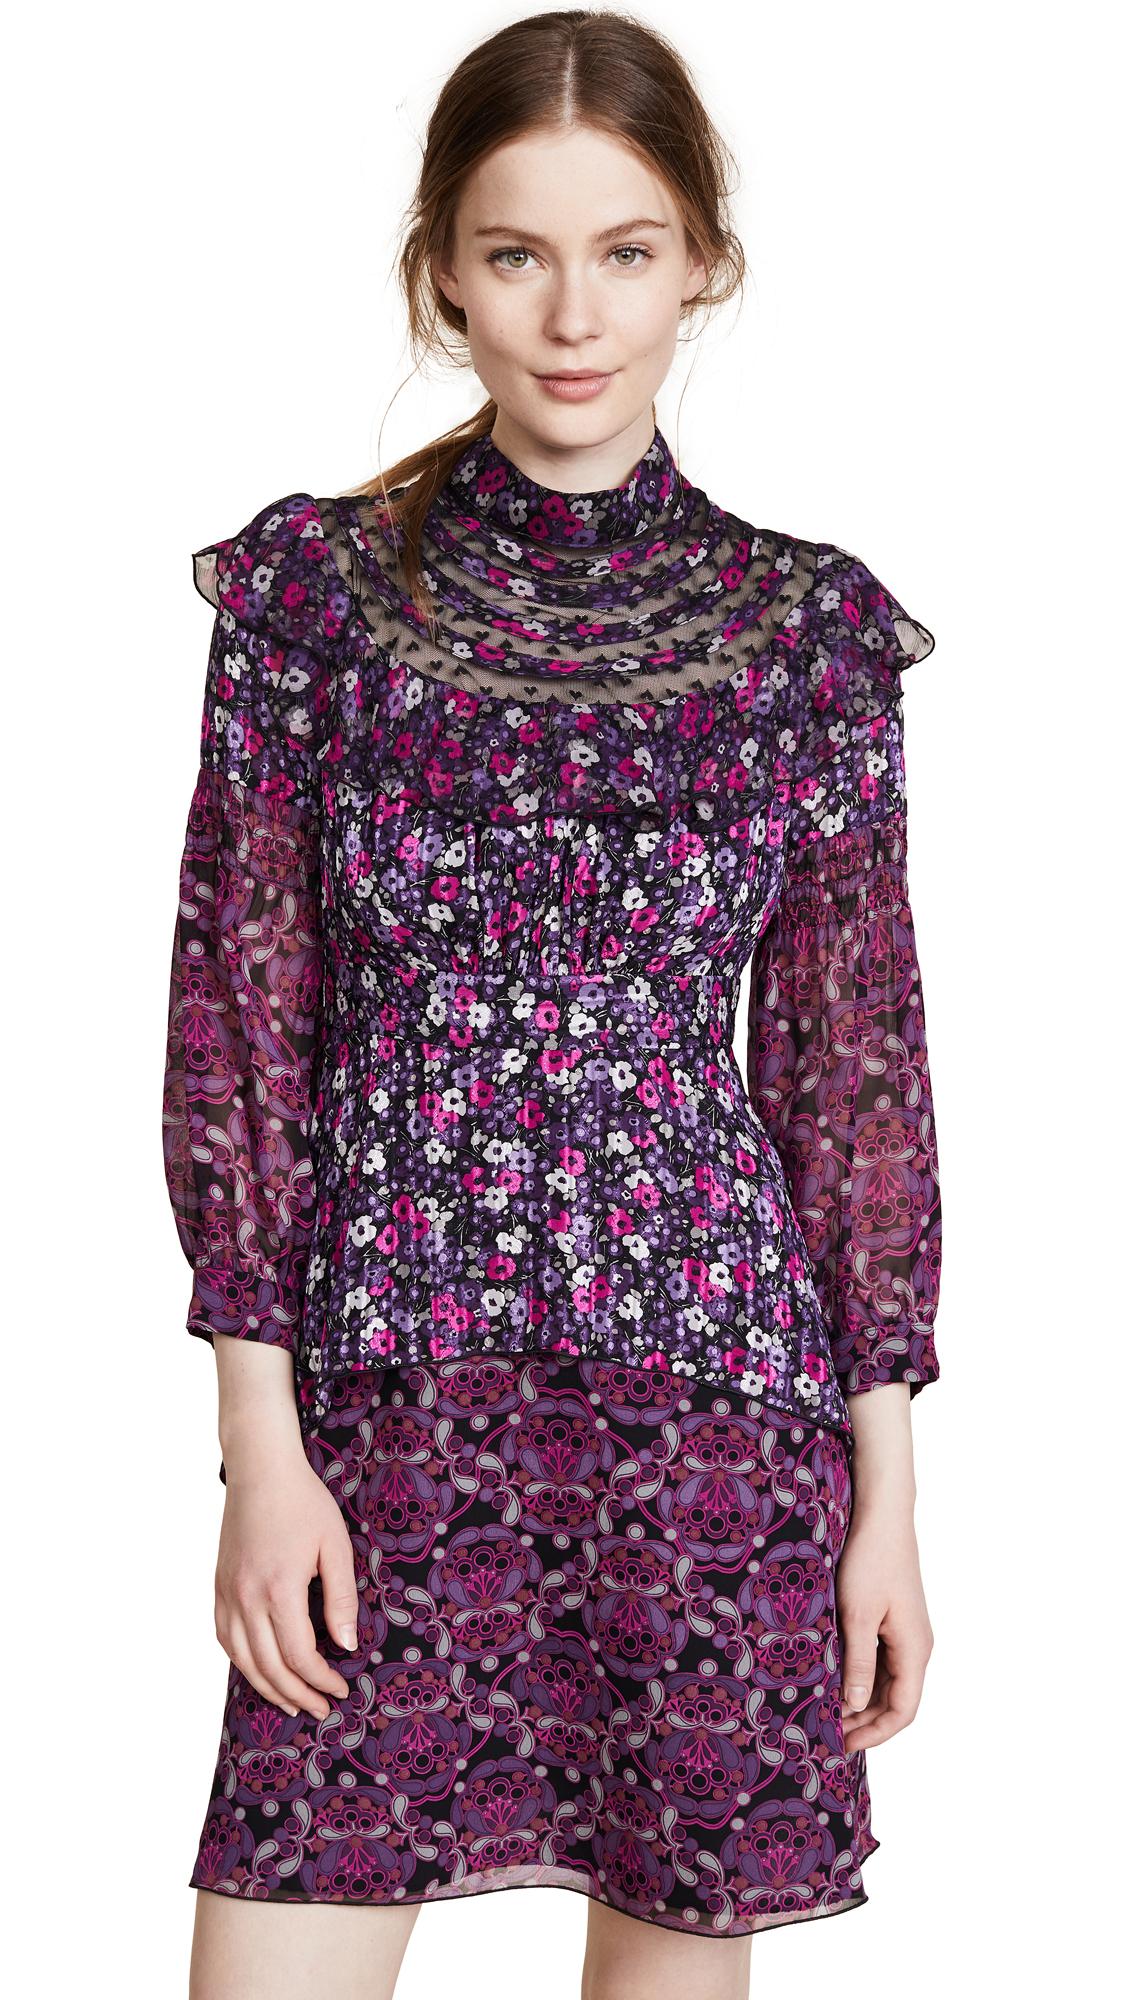 Anna Sui Joy Dress